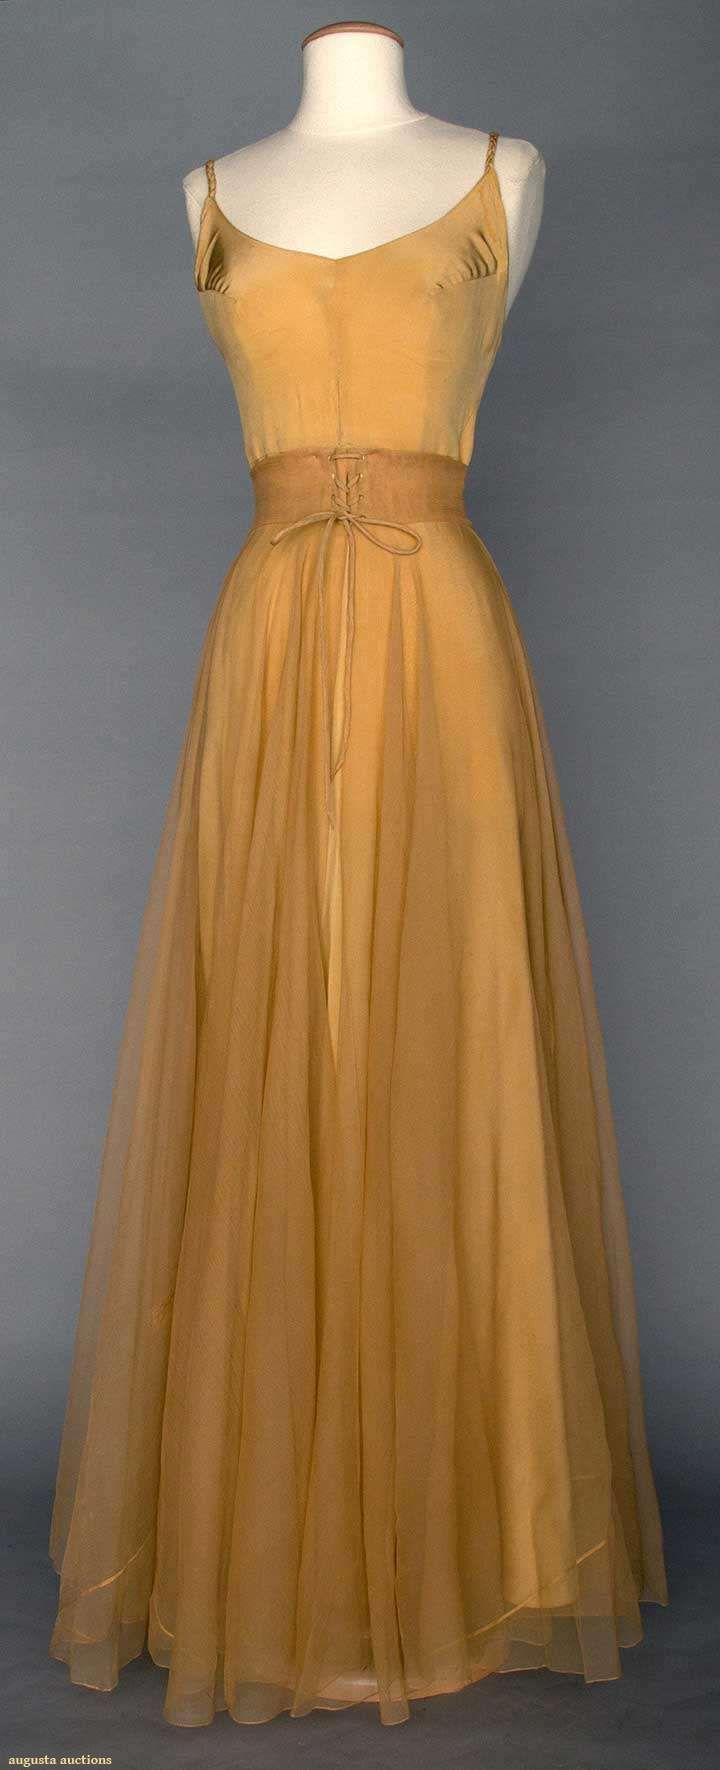 Valentina silk evening skirt s unlabeled u bought at valentina